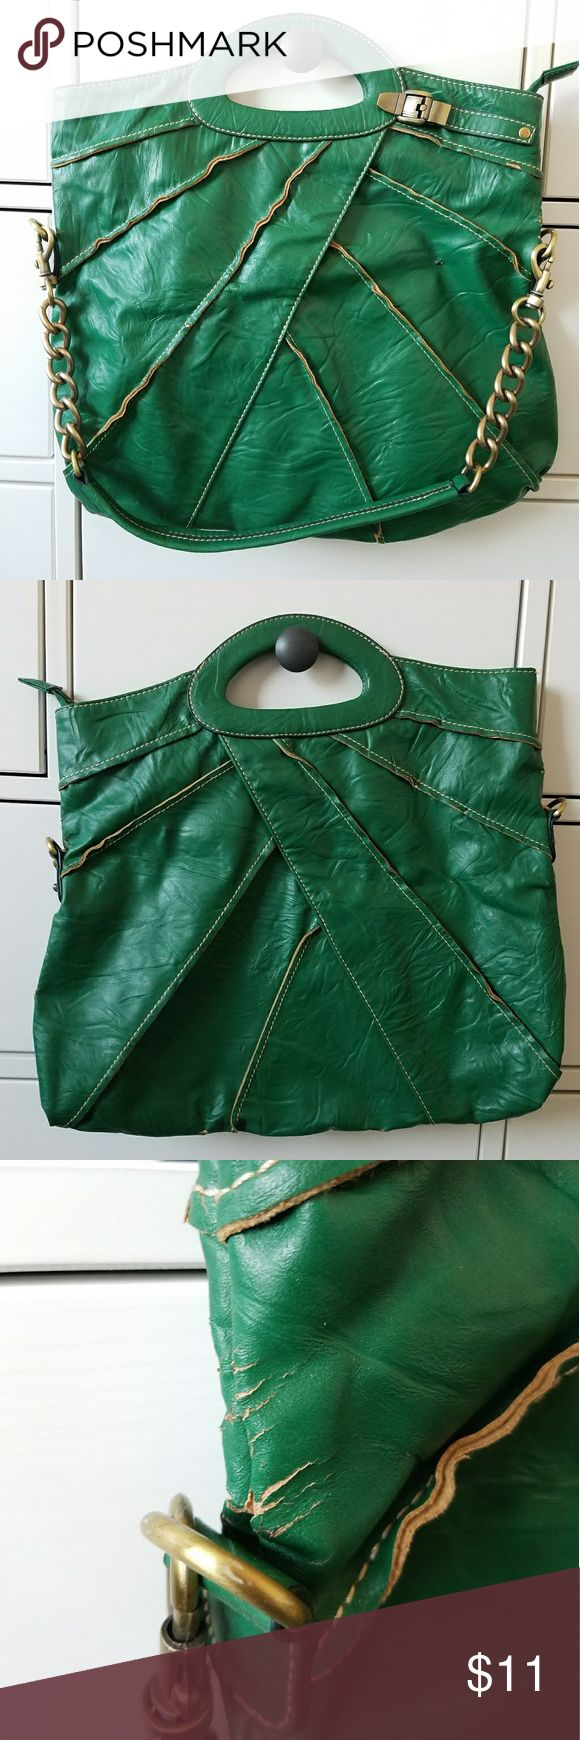 I just added this listing on Poshmark: Melie Bianco green handbag. #shopmycloset #poshmark #fashion #shopping #style #forsale #Melie Bianco #Handbags